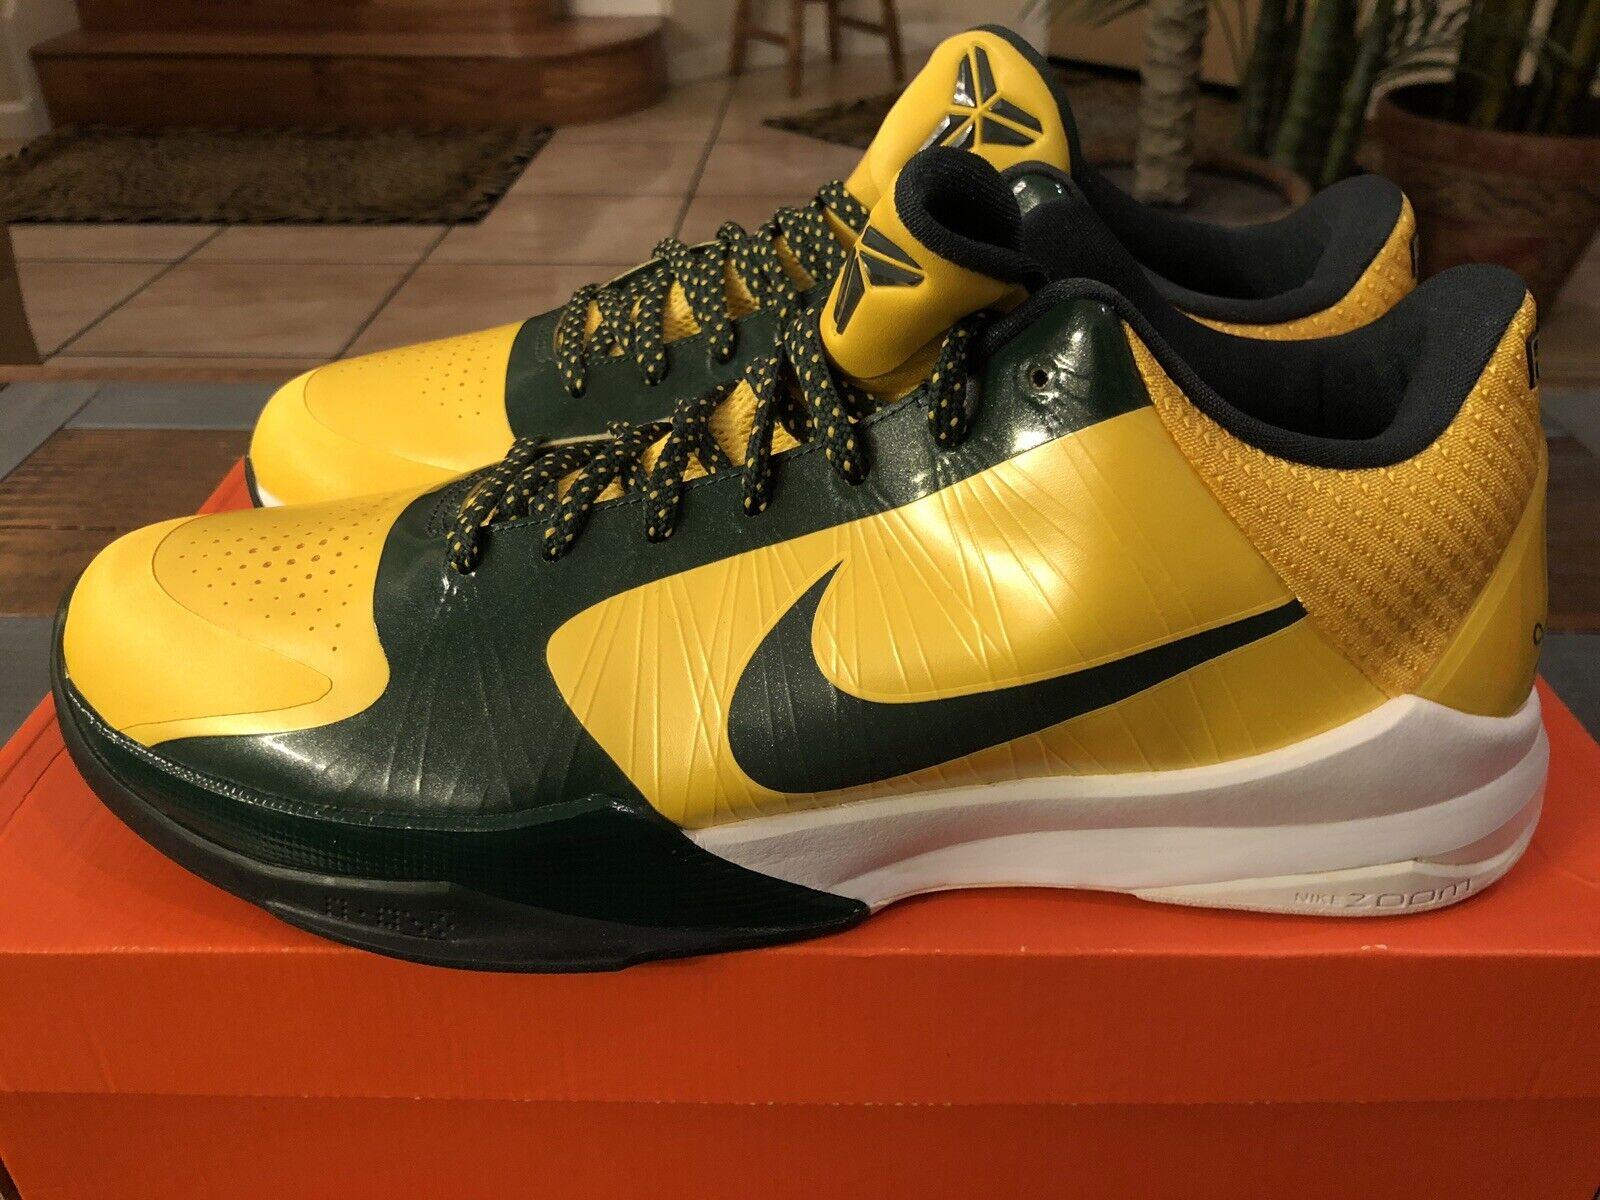 Nike 2009 Zoom Kobe V 5 Rice High School Edition Maize 386429-700 Size 13